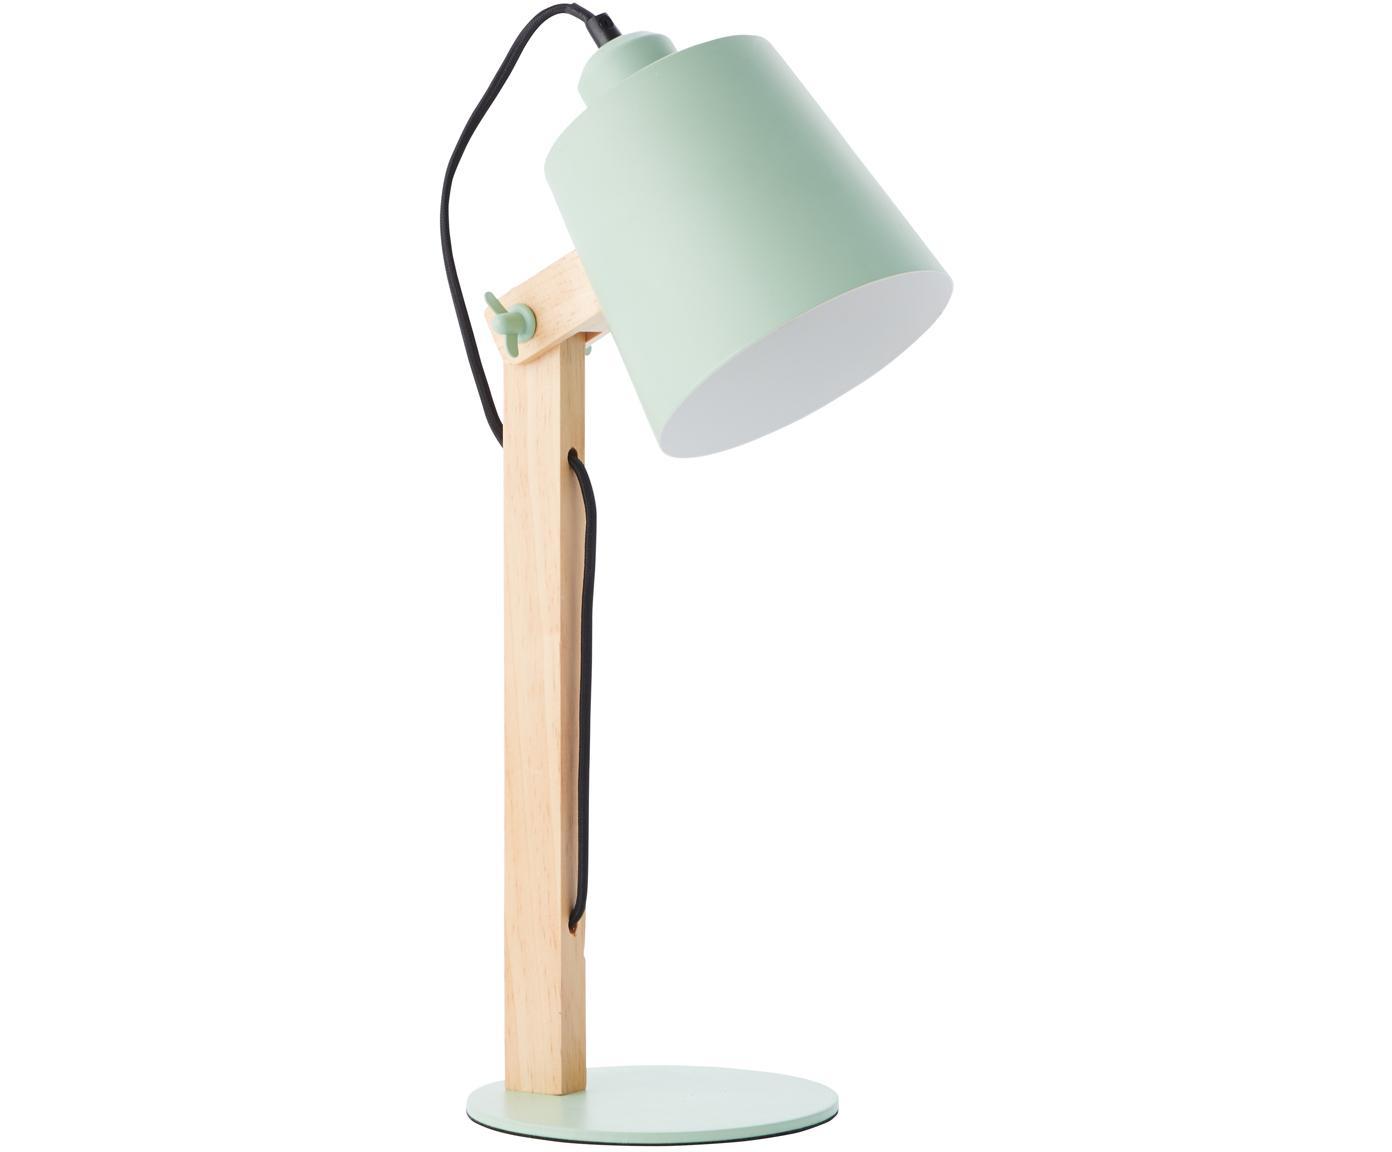 Skandi-Schreibtischlampe Swivel mit Holzfuß, Lampenschirm: Metall, Lampenfuß: Metall, Mintgrün, Holz, 16 x 52 cm